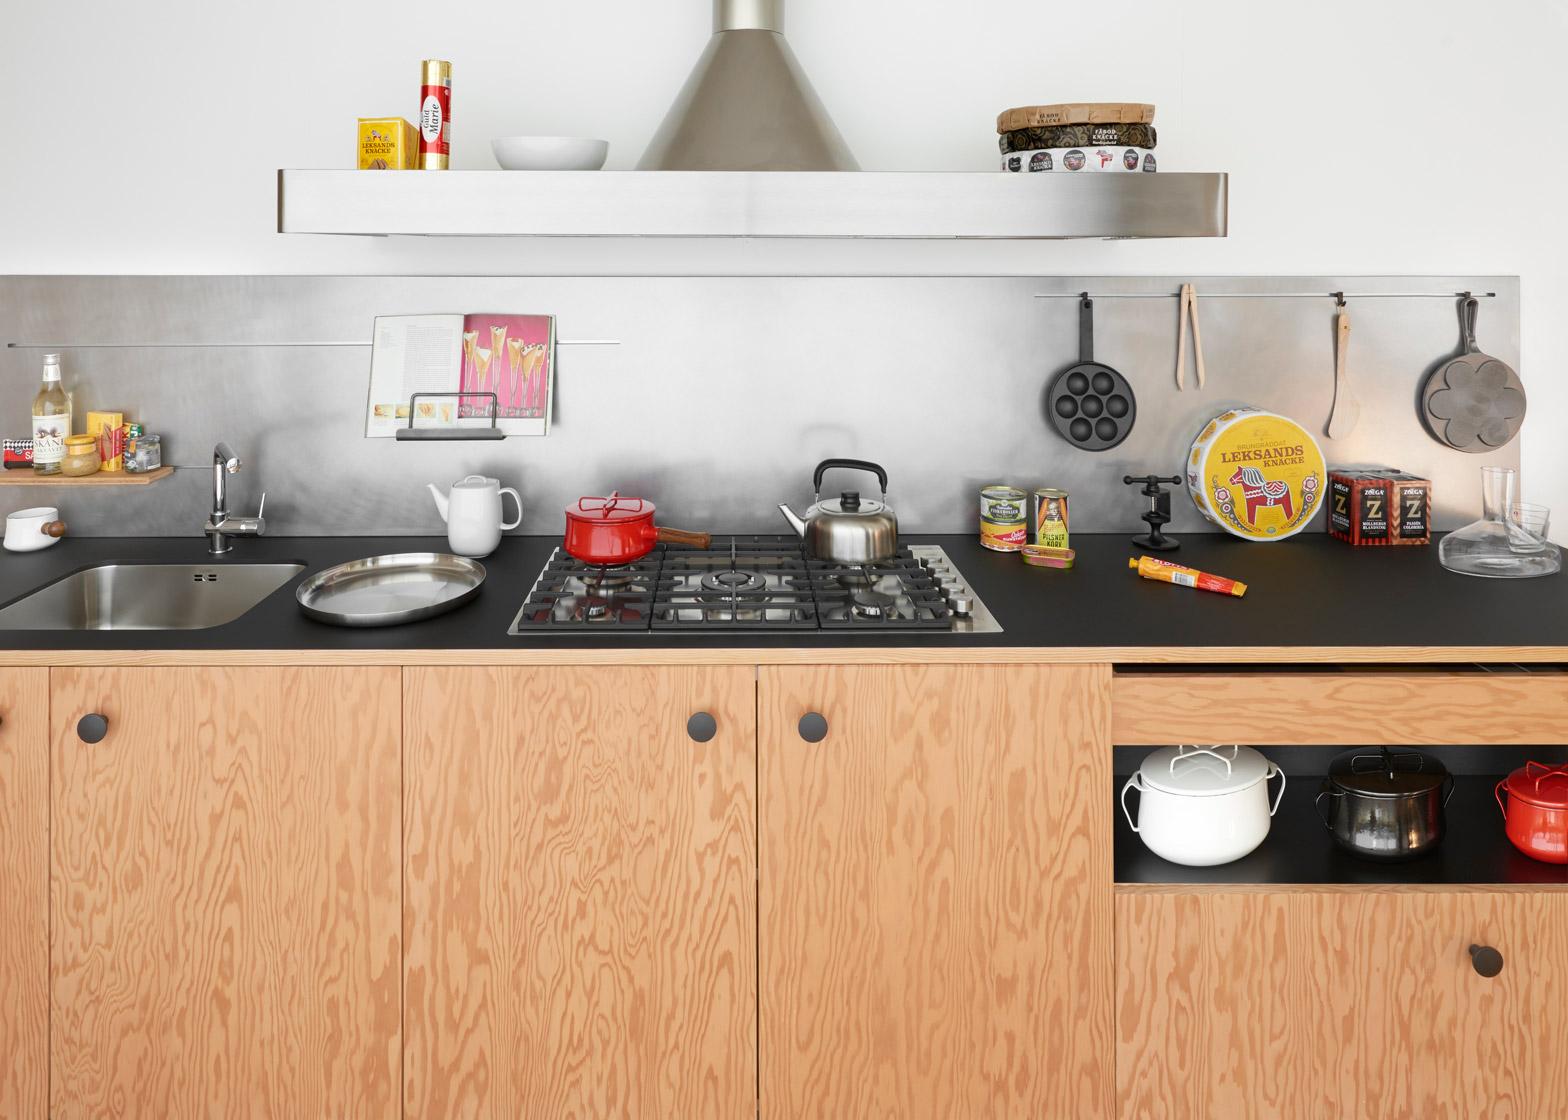 Lepic Kitchen by Jasper Morrison